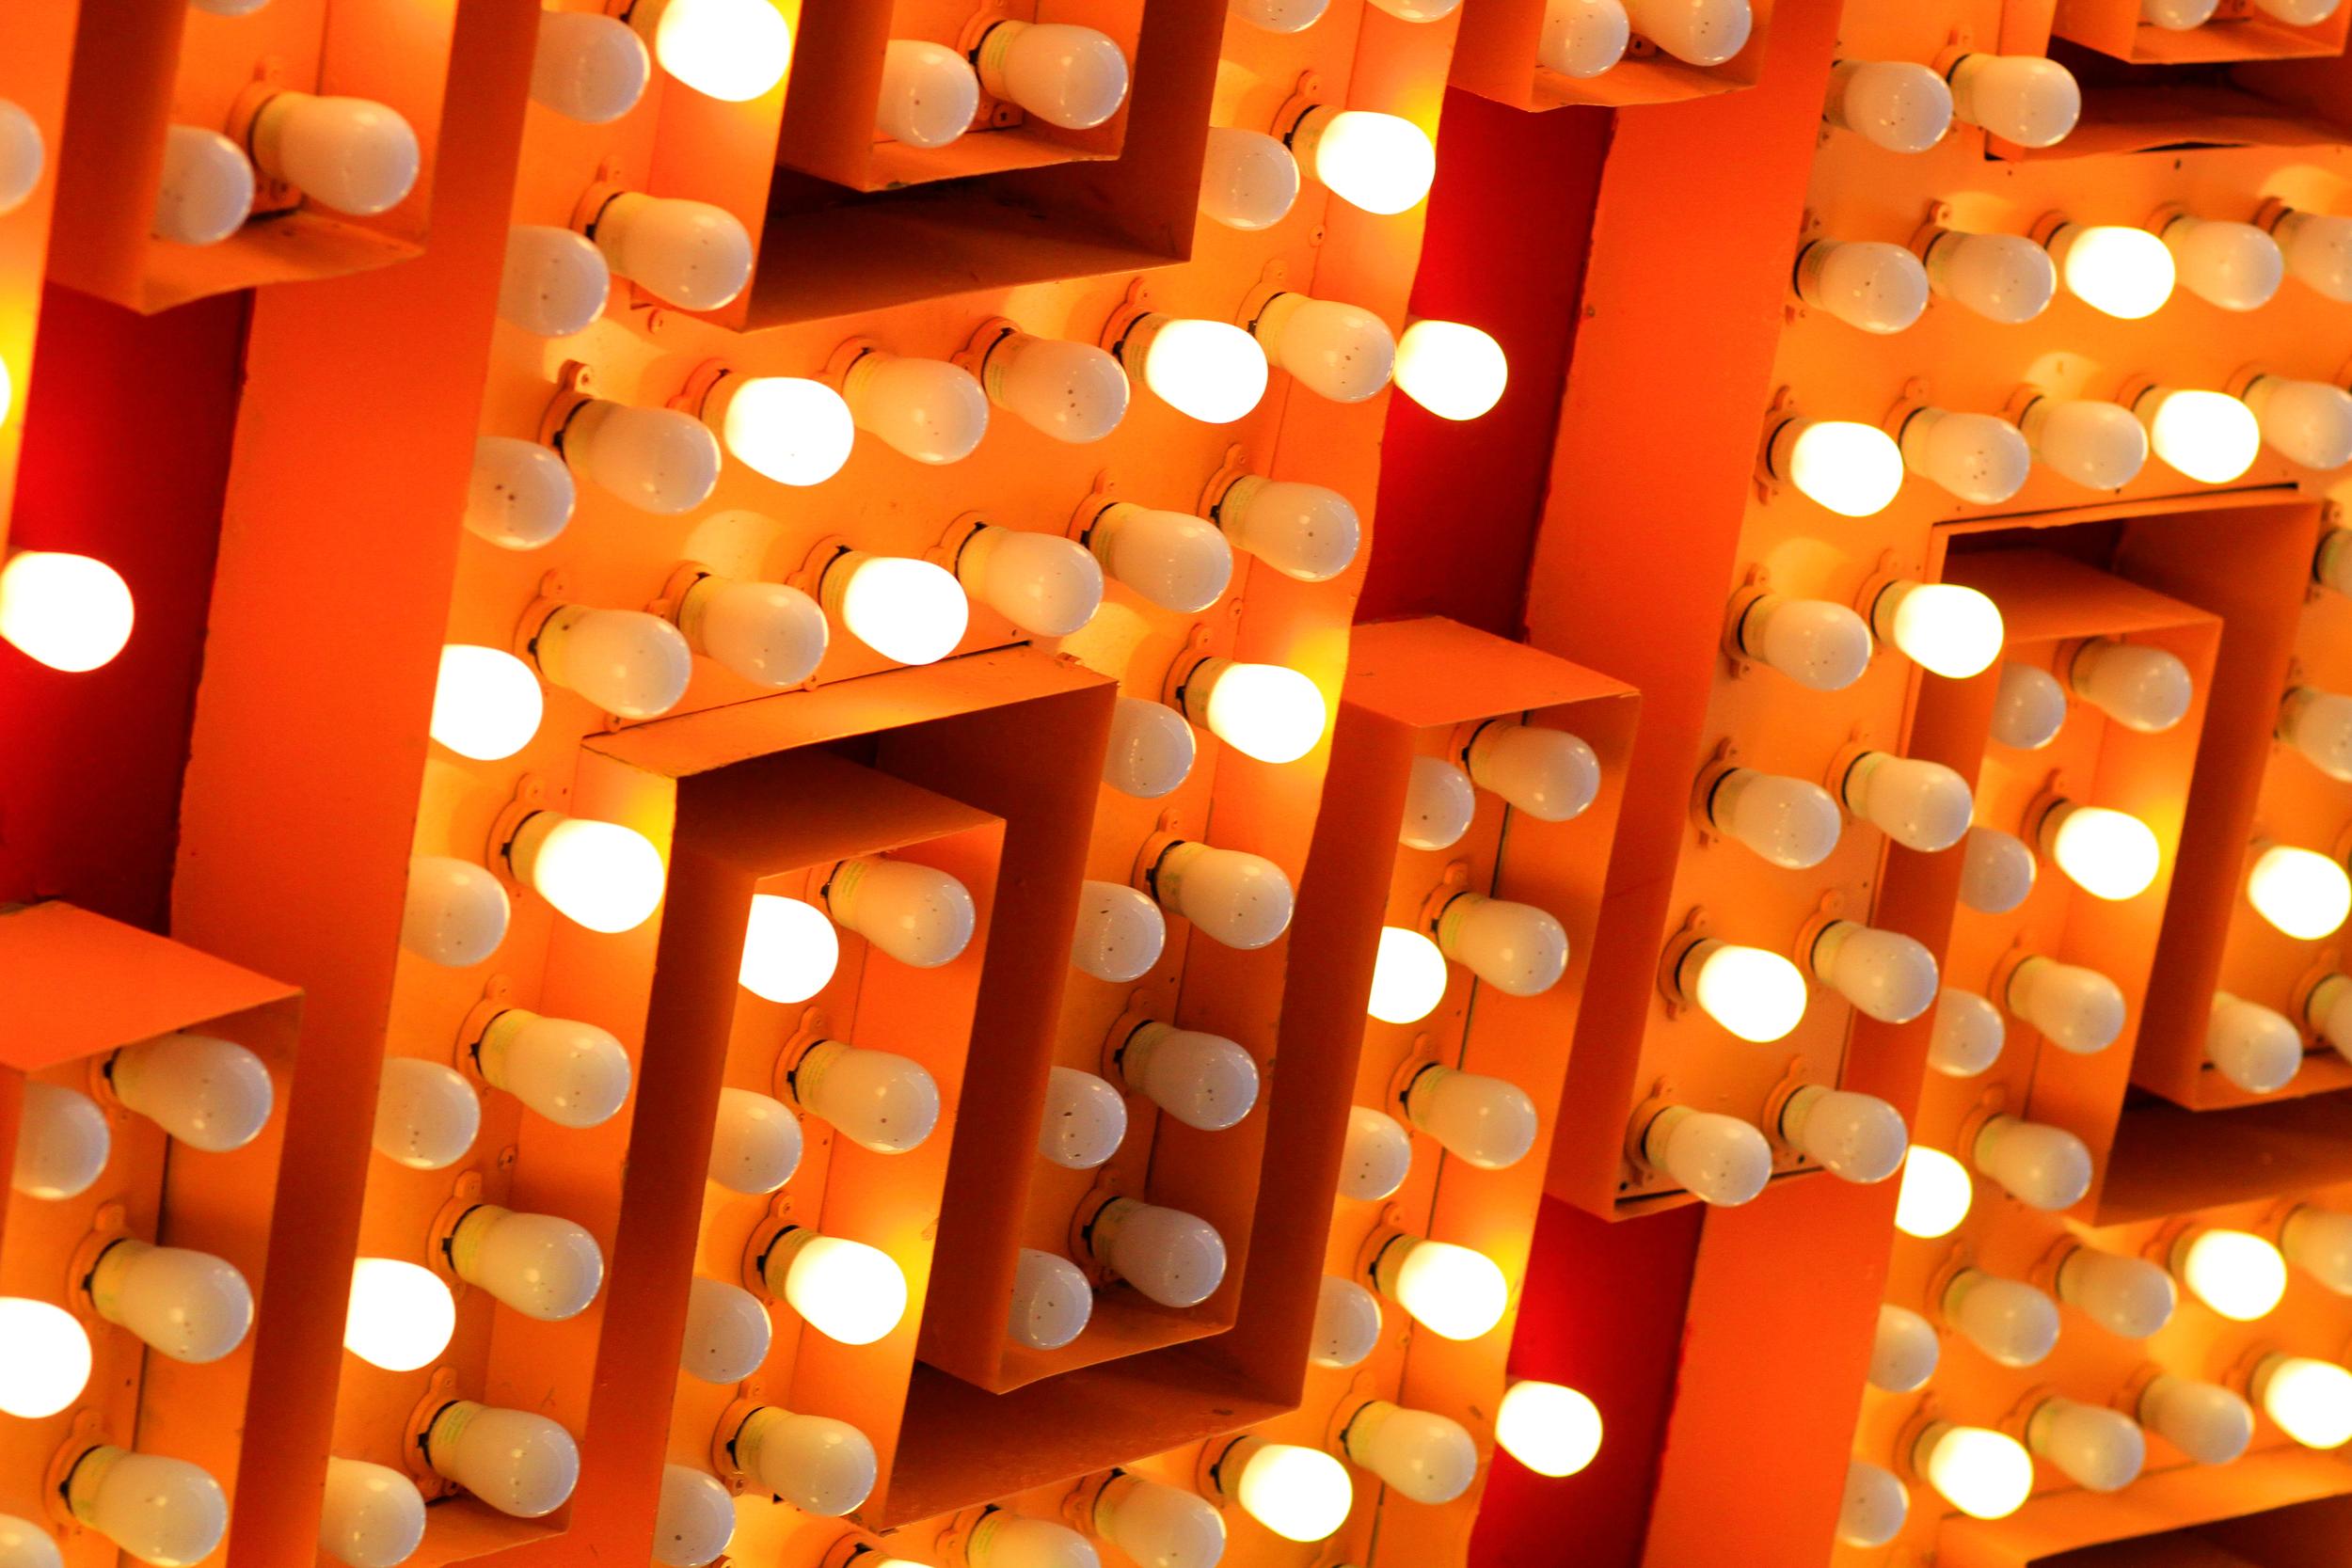 Neon-Museum-1.jpg